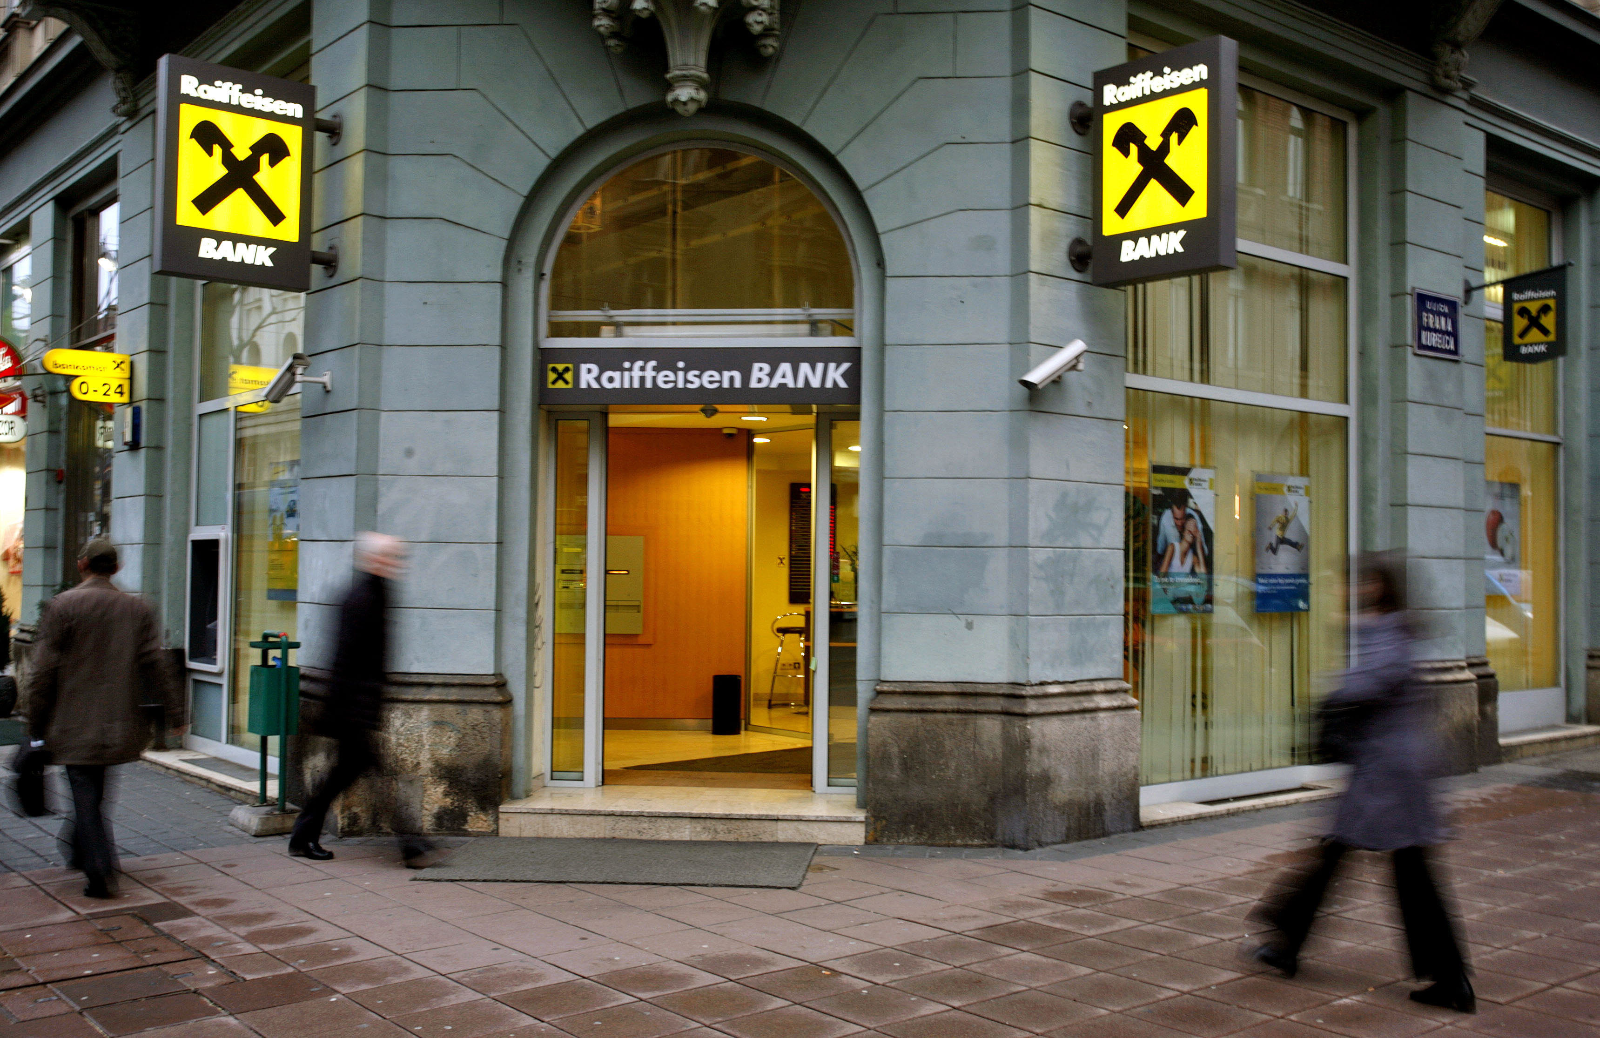 Nevjerojatan Podatak Banke Naplaćuju Građanima čak 400